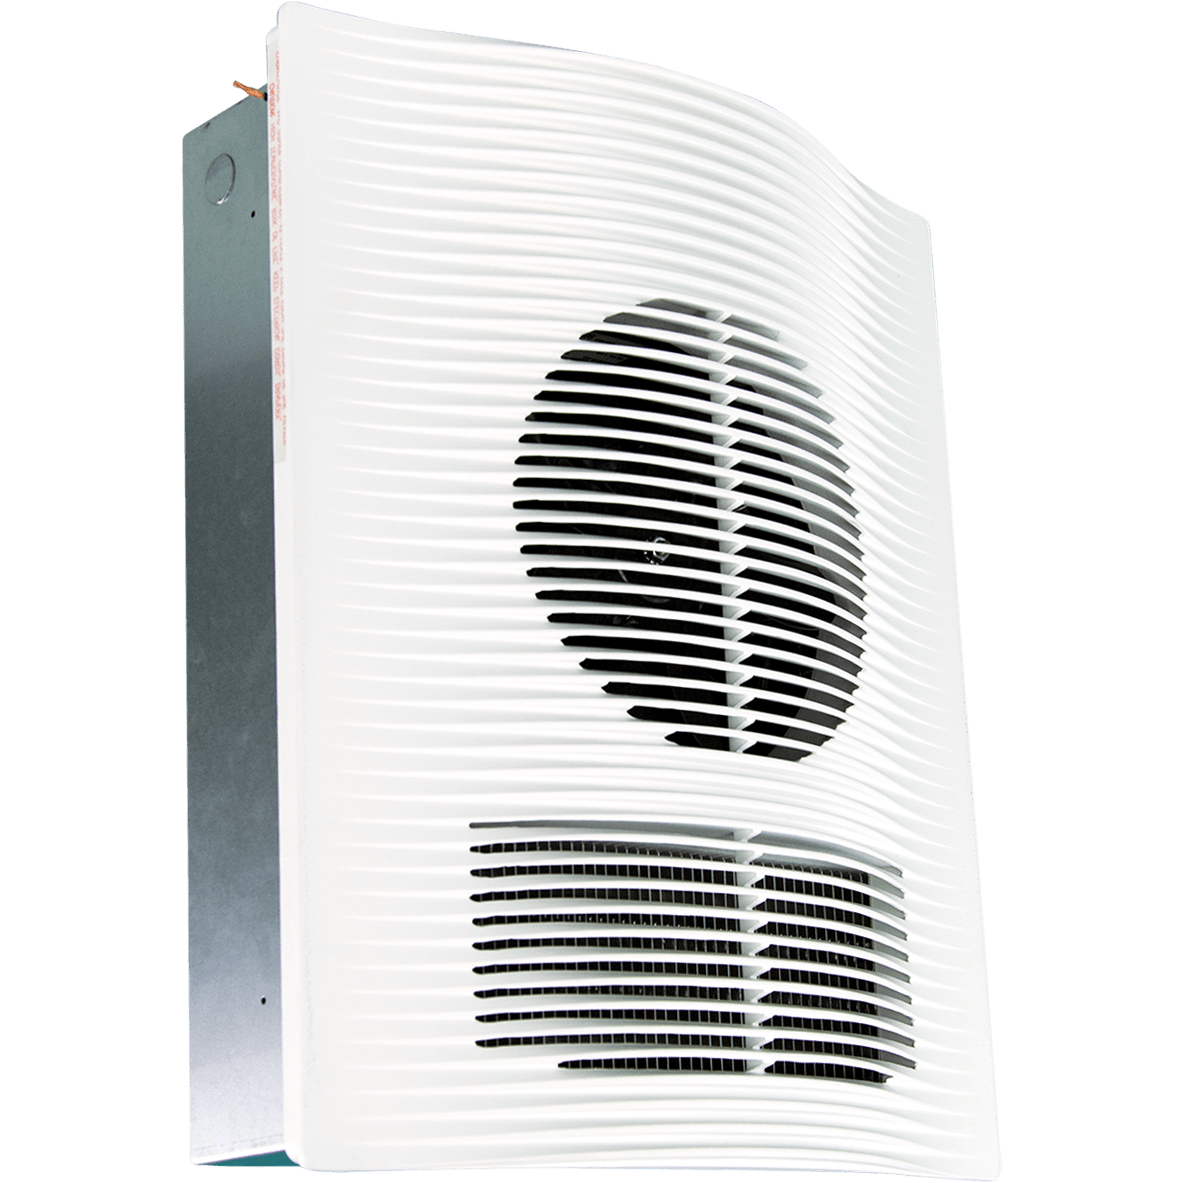 Qmark Ssar Smart Series Programmable Wall Heaters Sylvane Heater Wiring Diagram